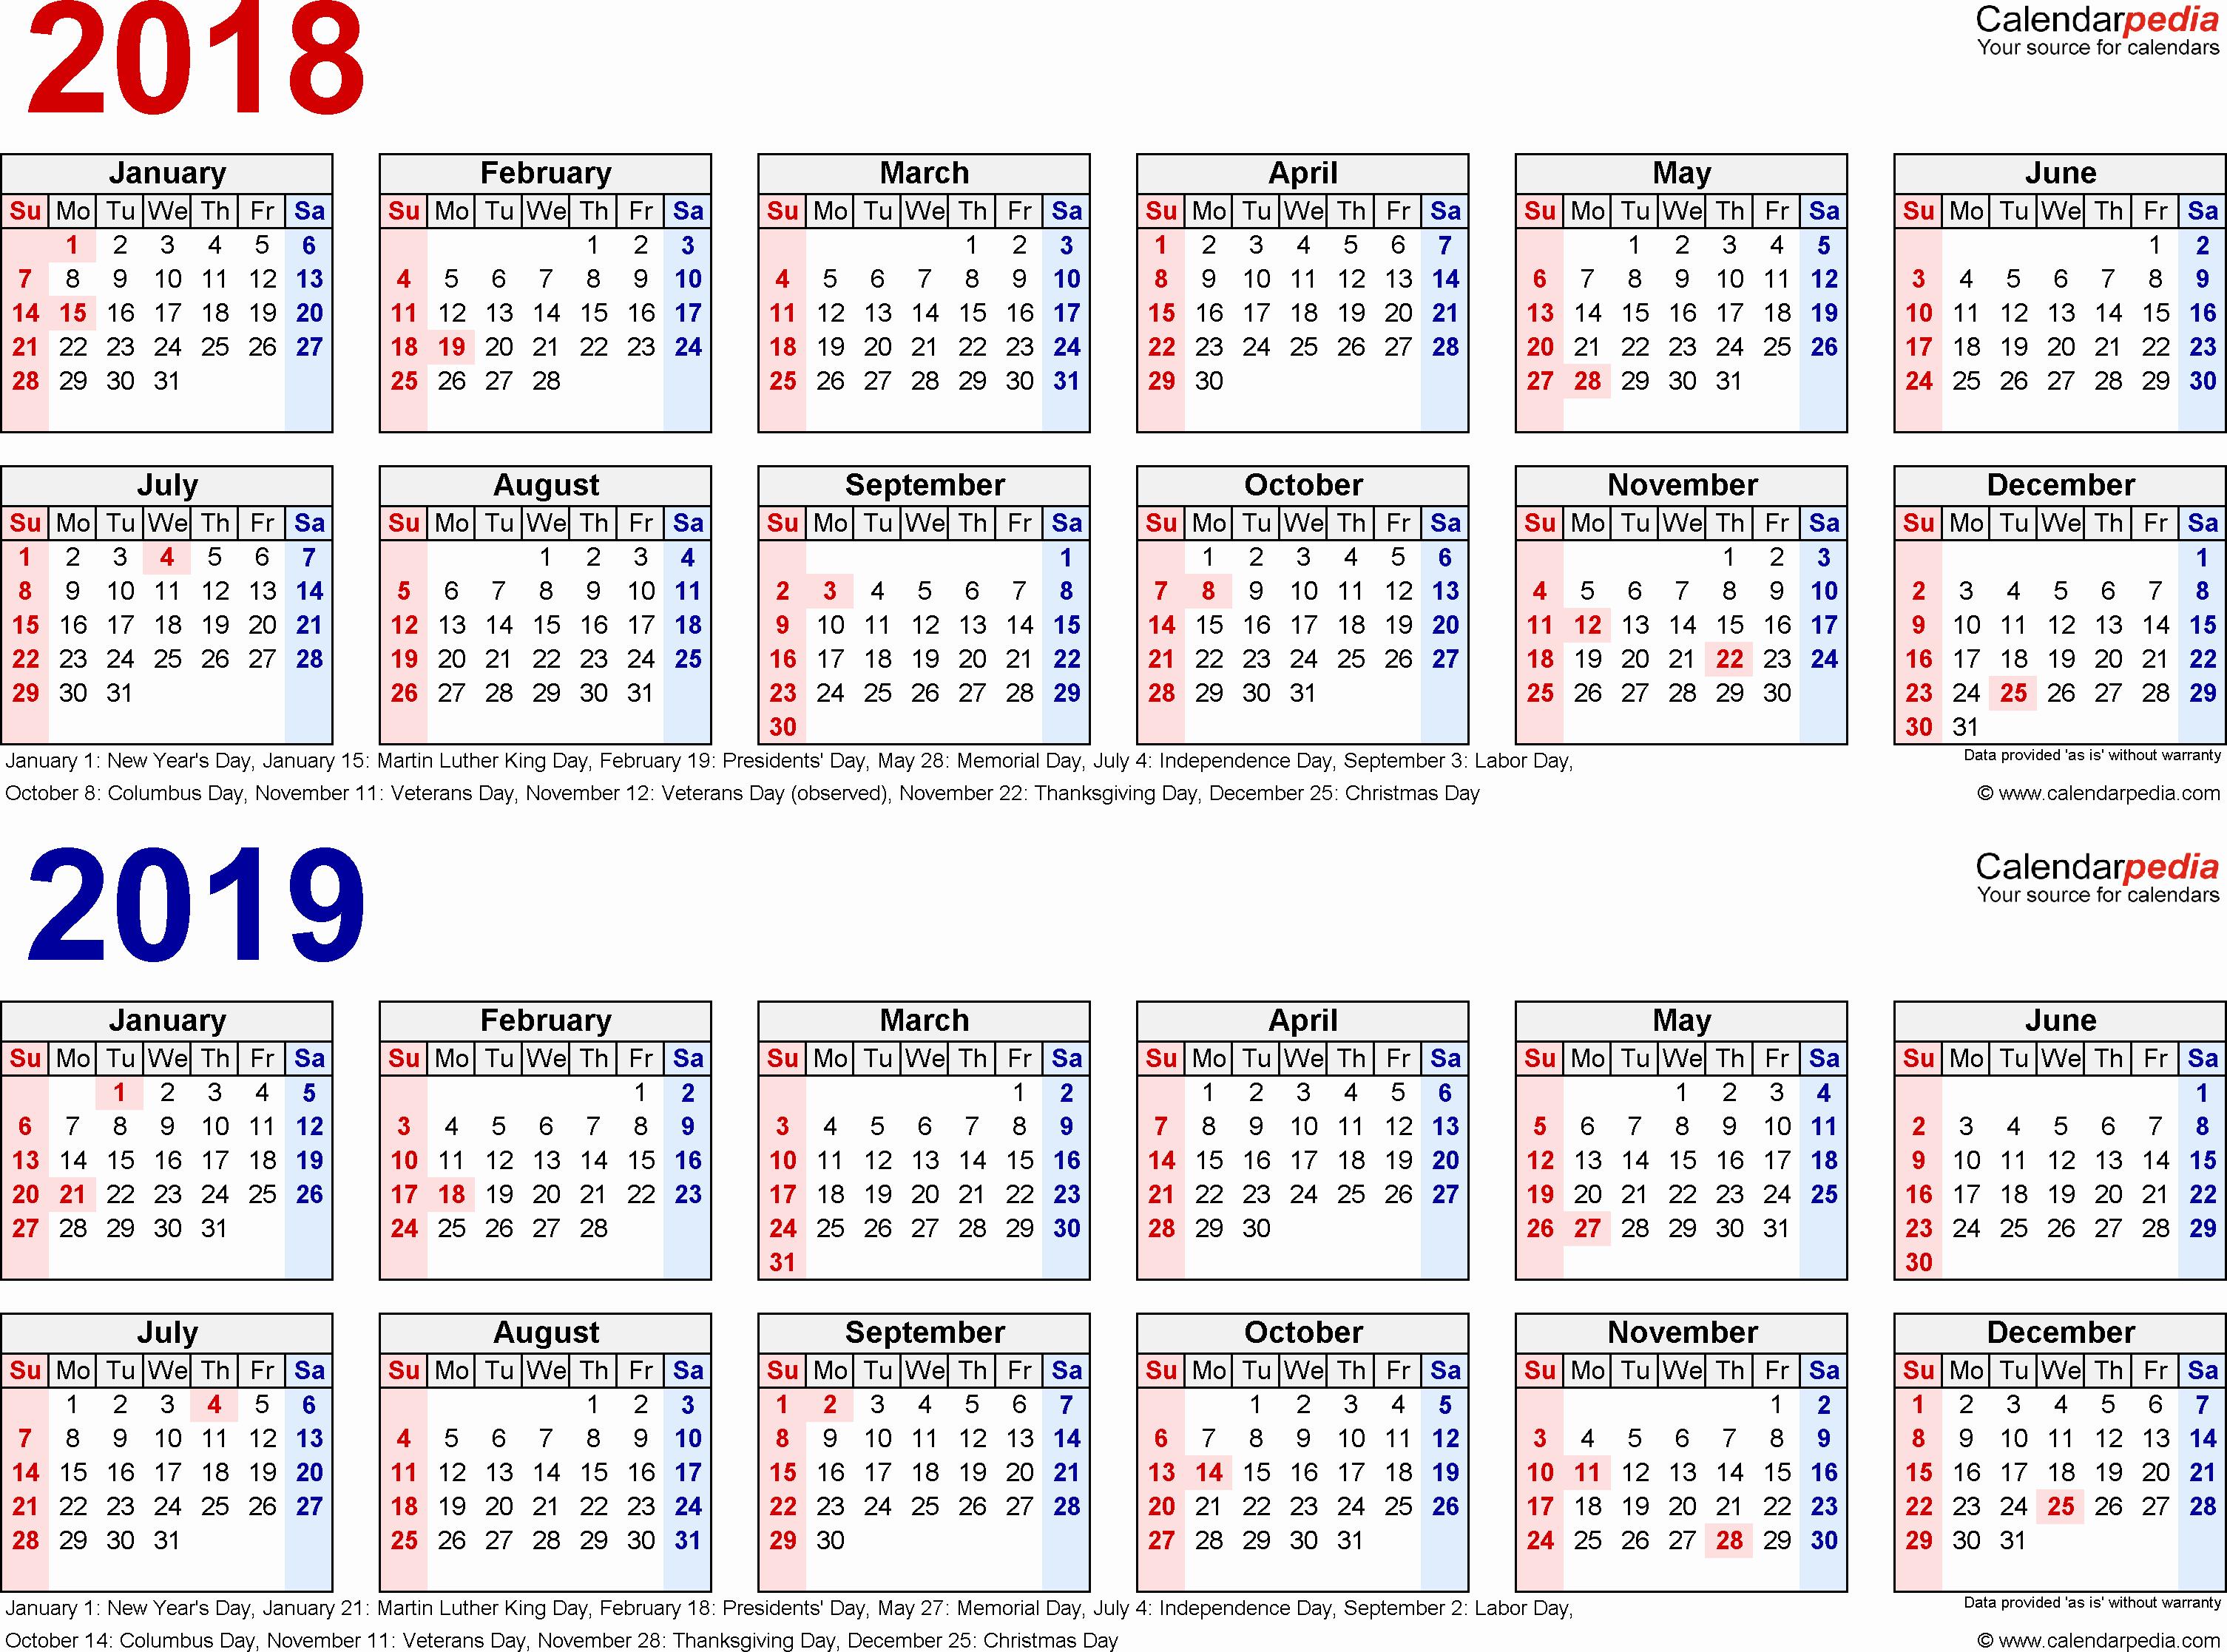 2019 Biweekly Payroll Calendar Template Excel Fresh 2018 2019 Calendar Free Printable Two Year Excel Calendars